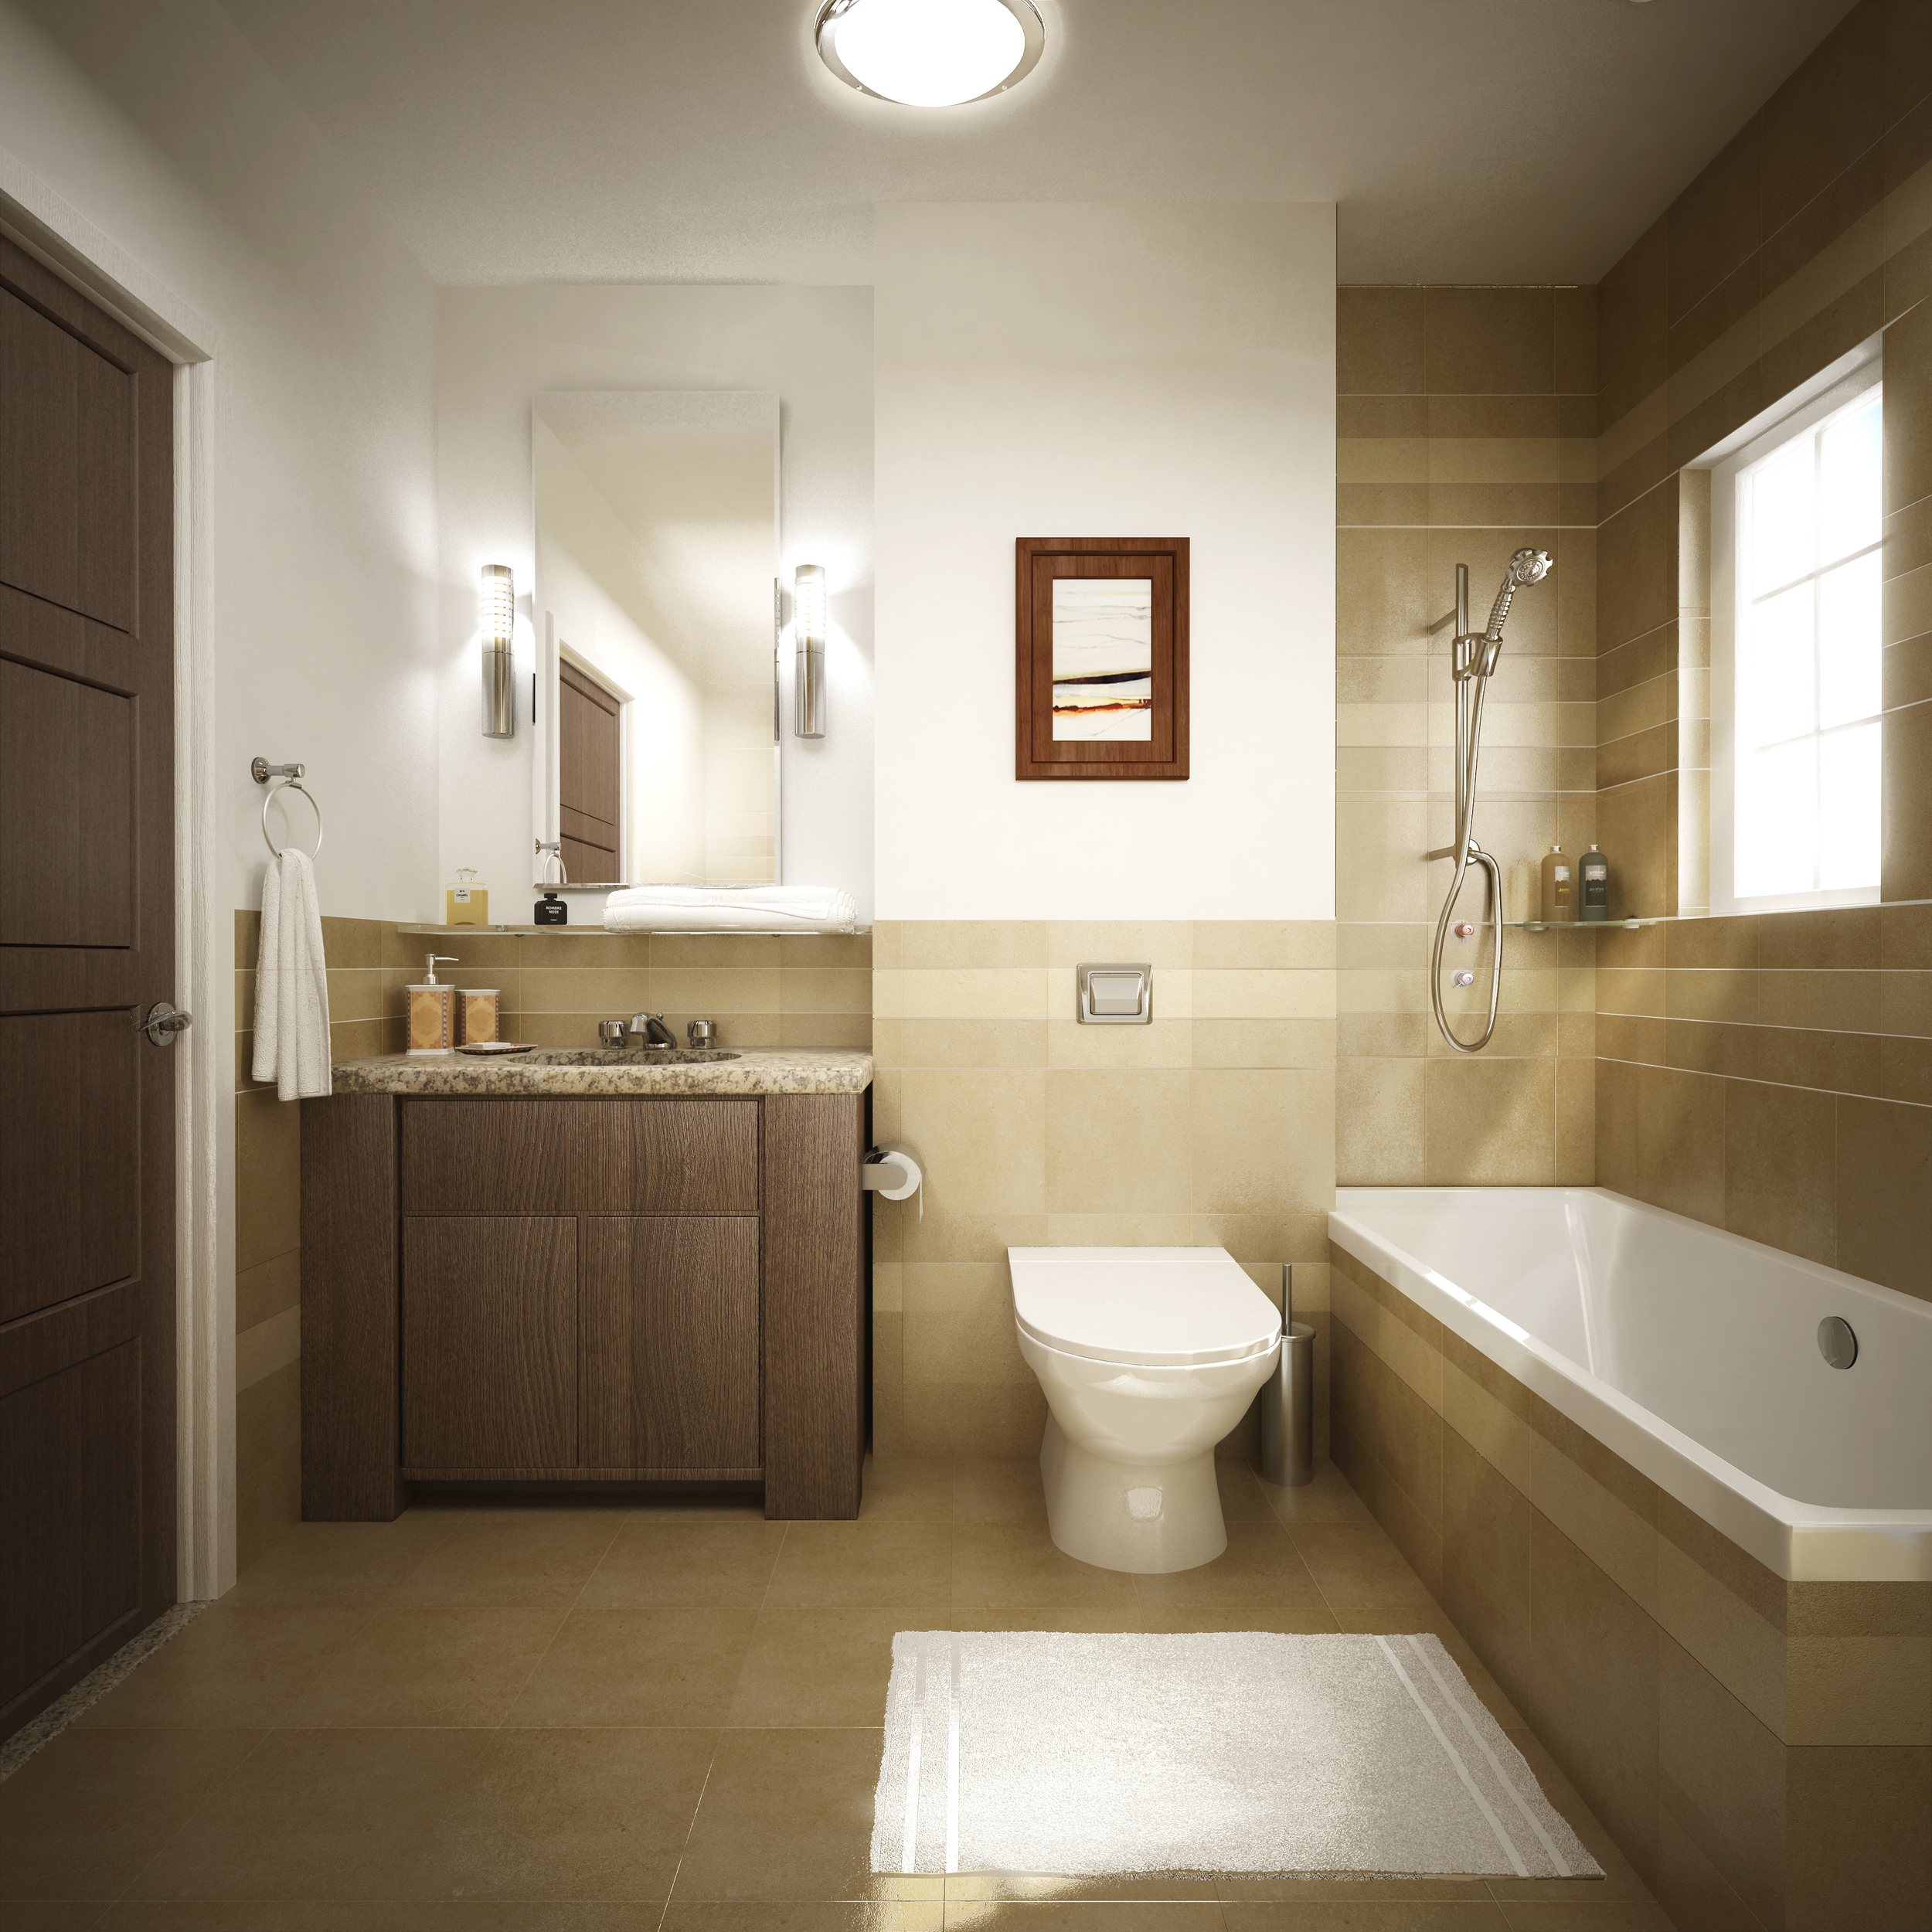 greek village at Marassi - typical bathroom